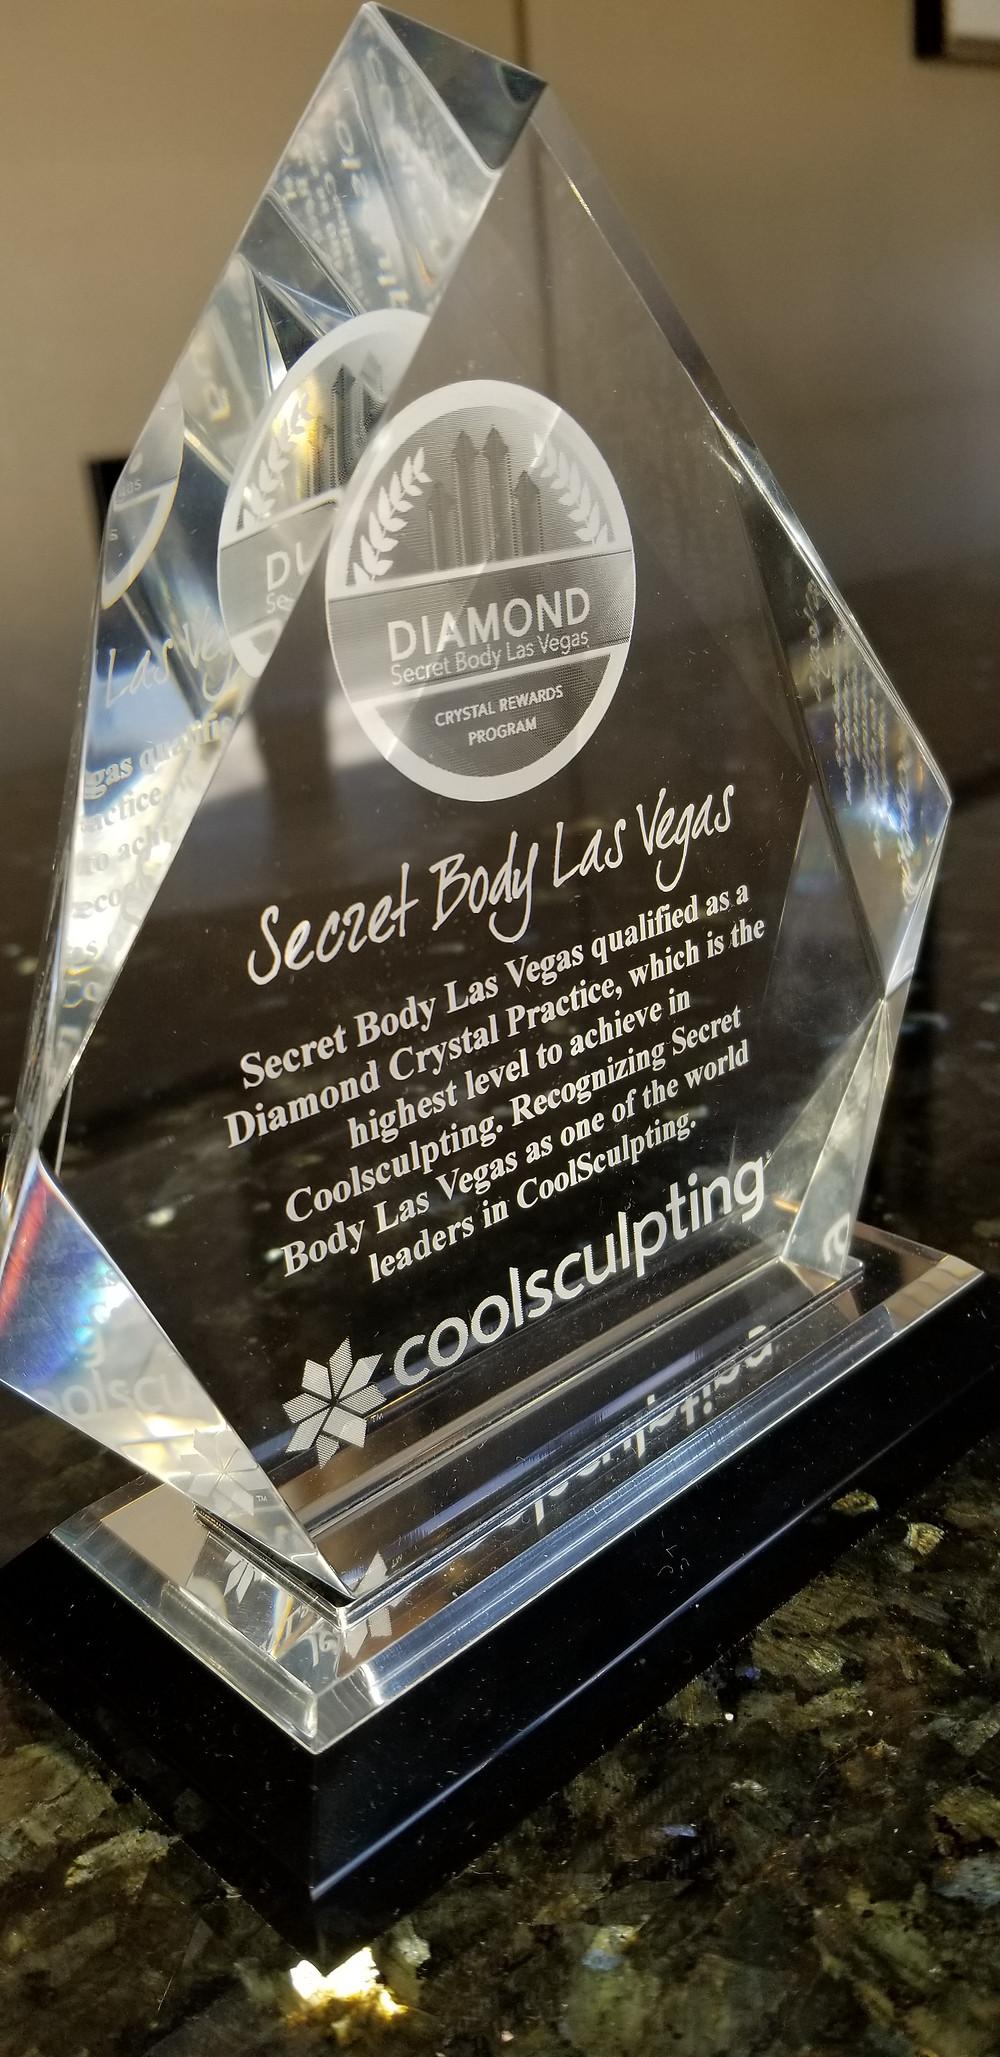 Diamond Coolsculpting Award Secret Body